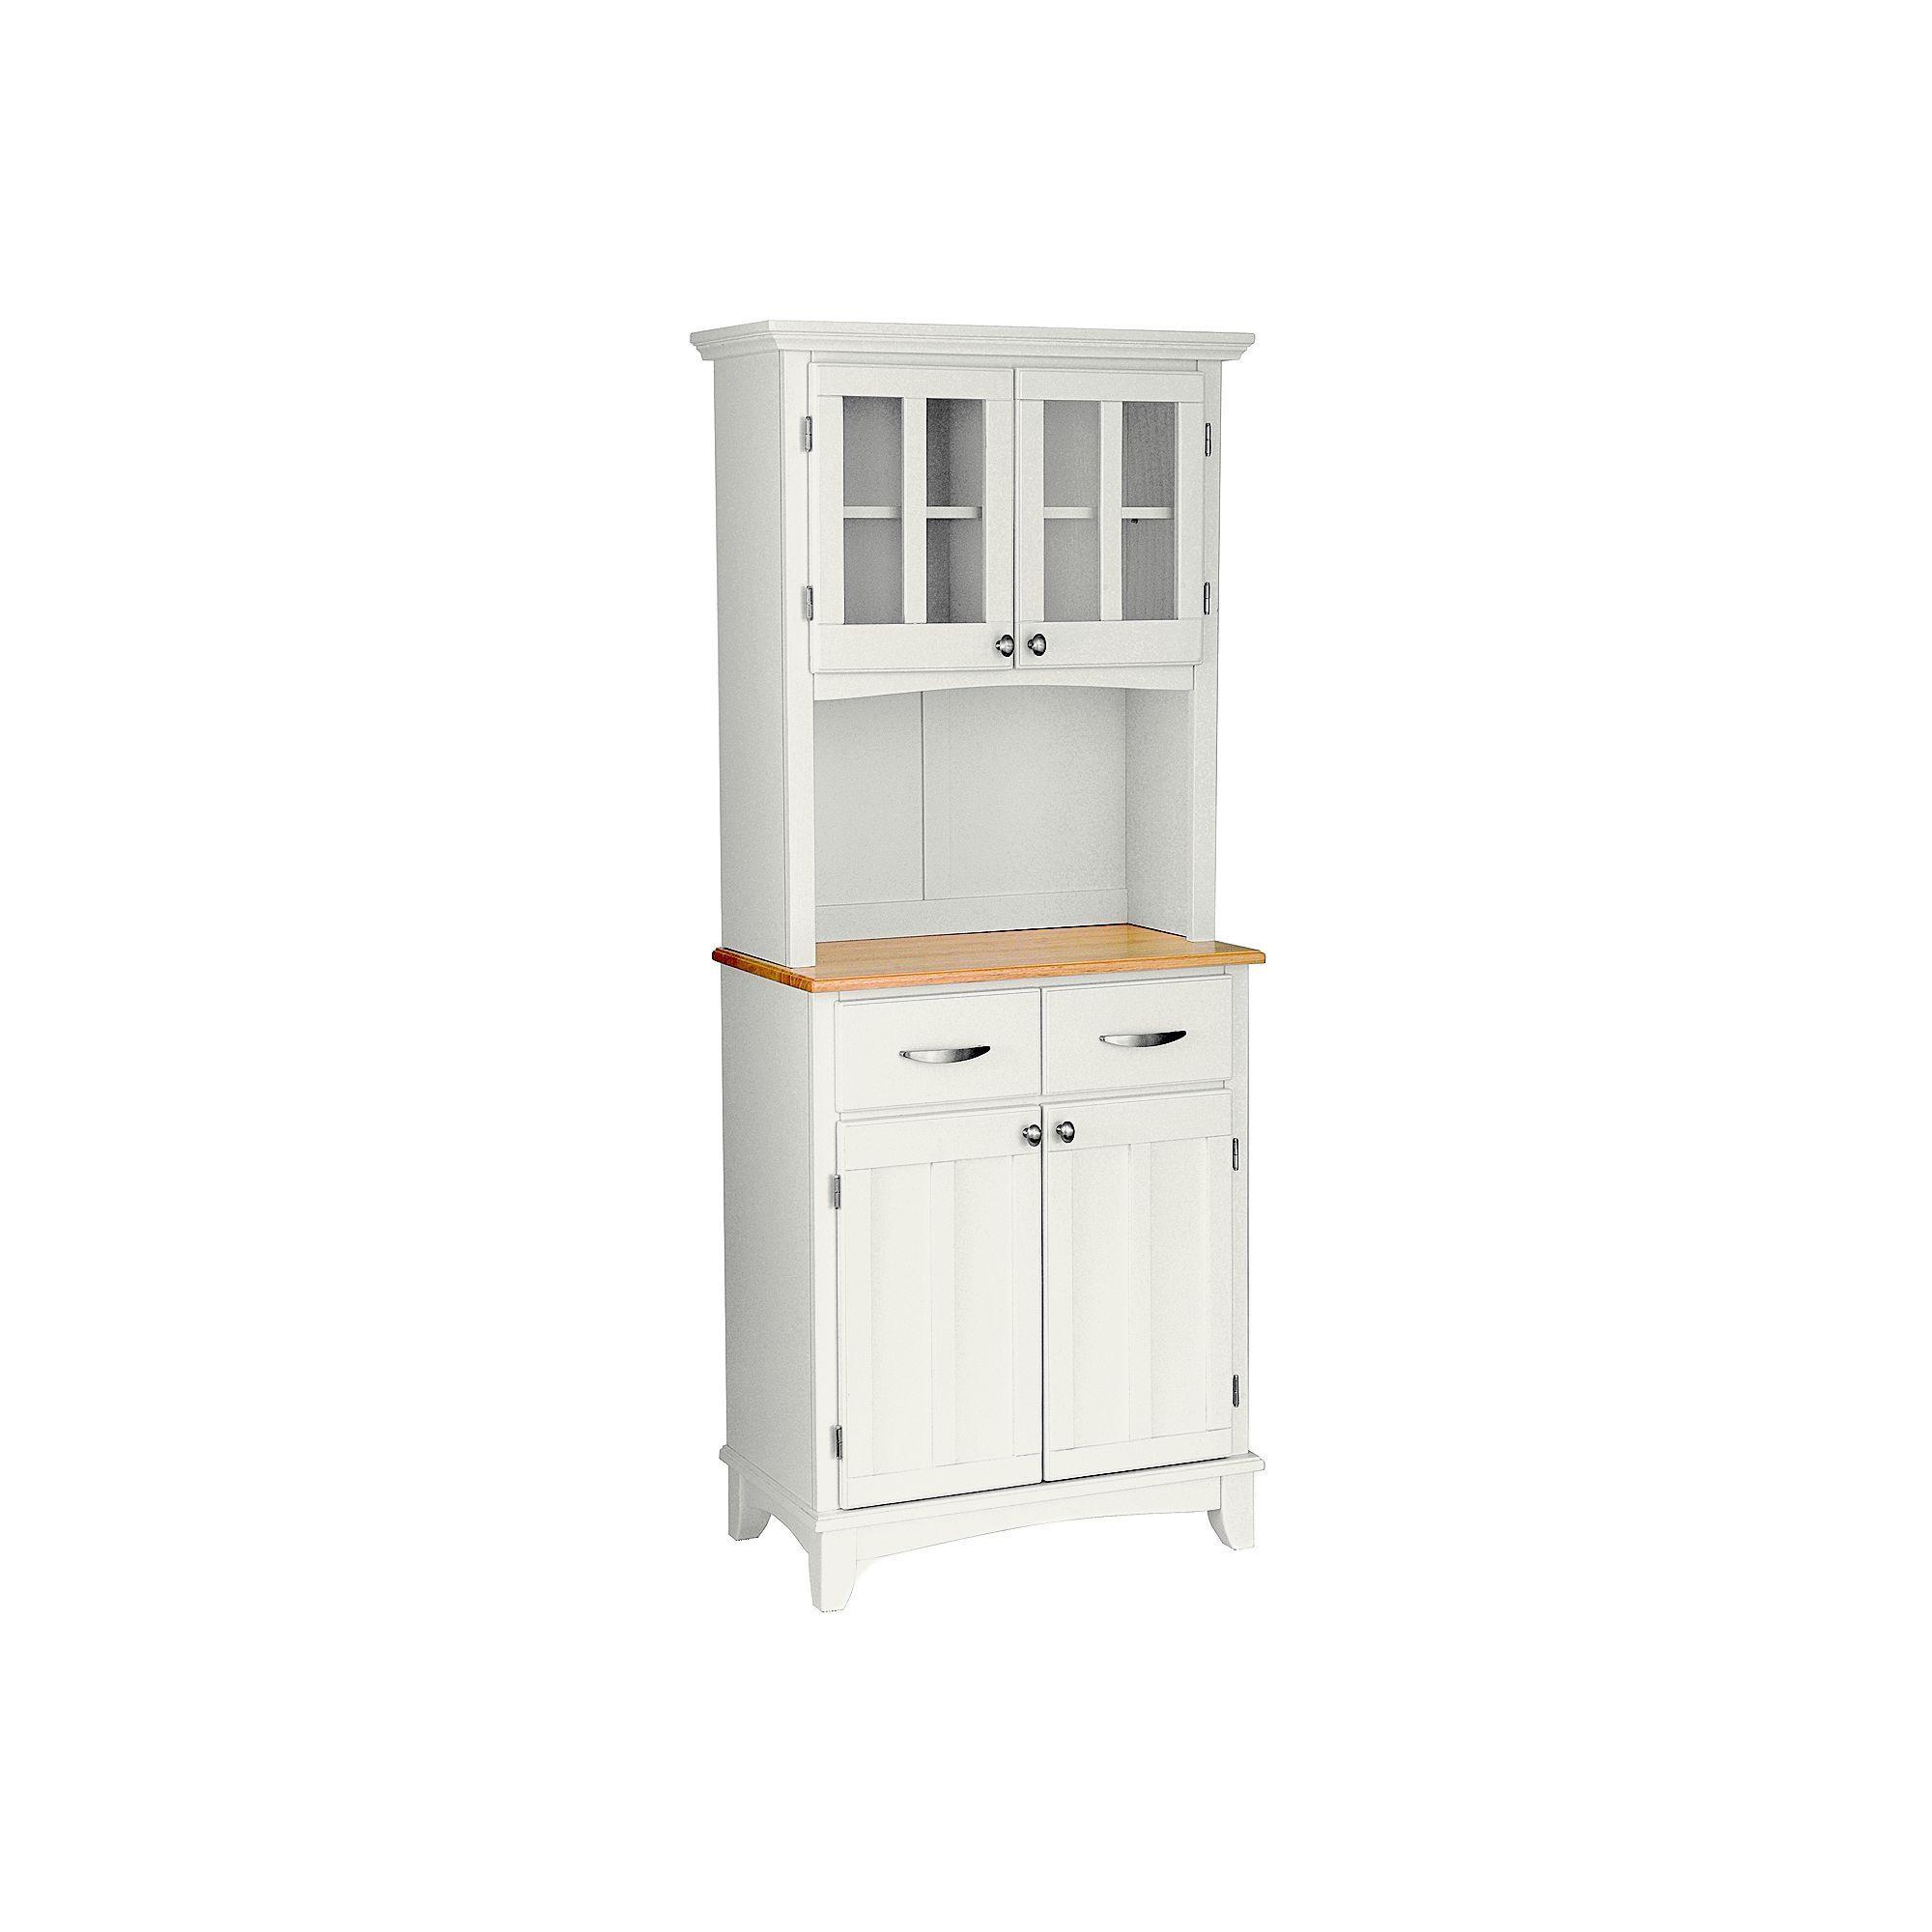 Download Wallpaper White Kitchen Small Hutch